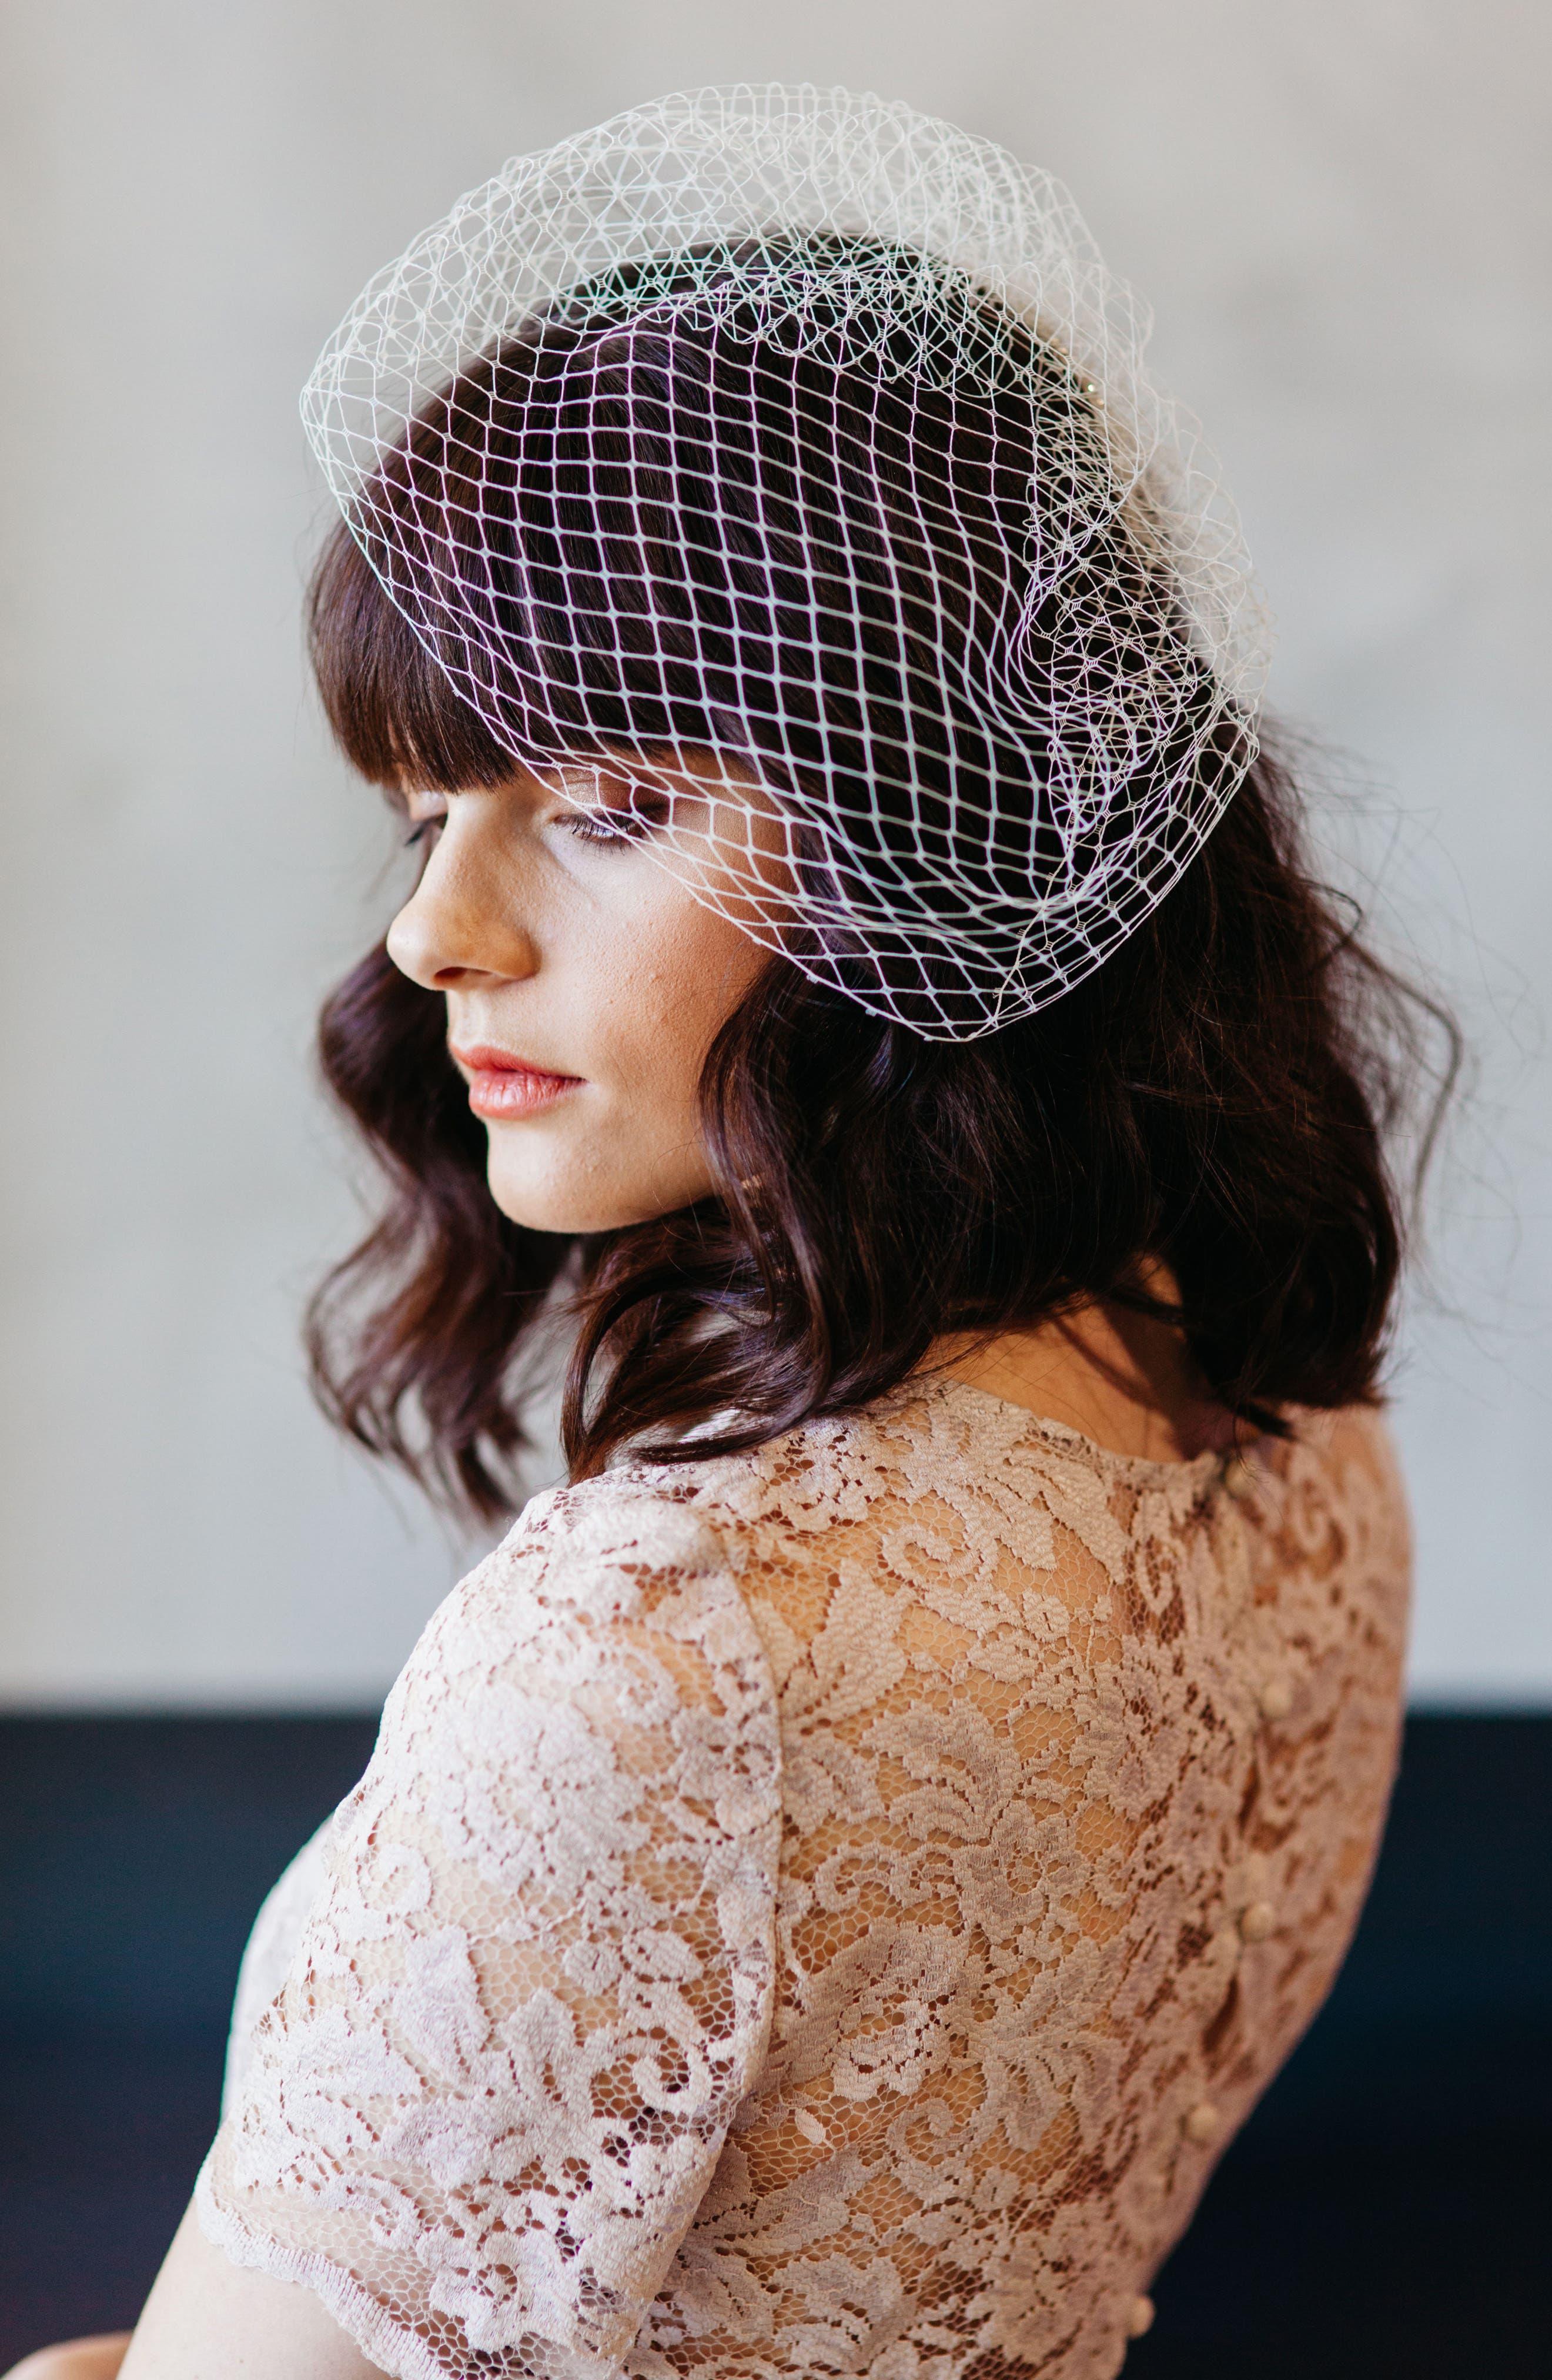 Main Image - J-Picone Bridal Veil Hairpin